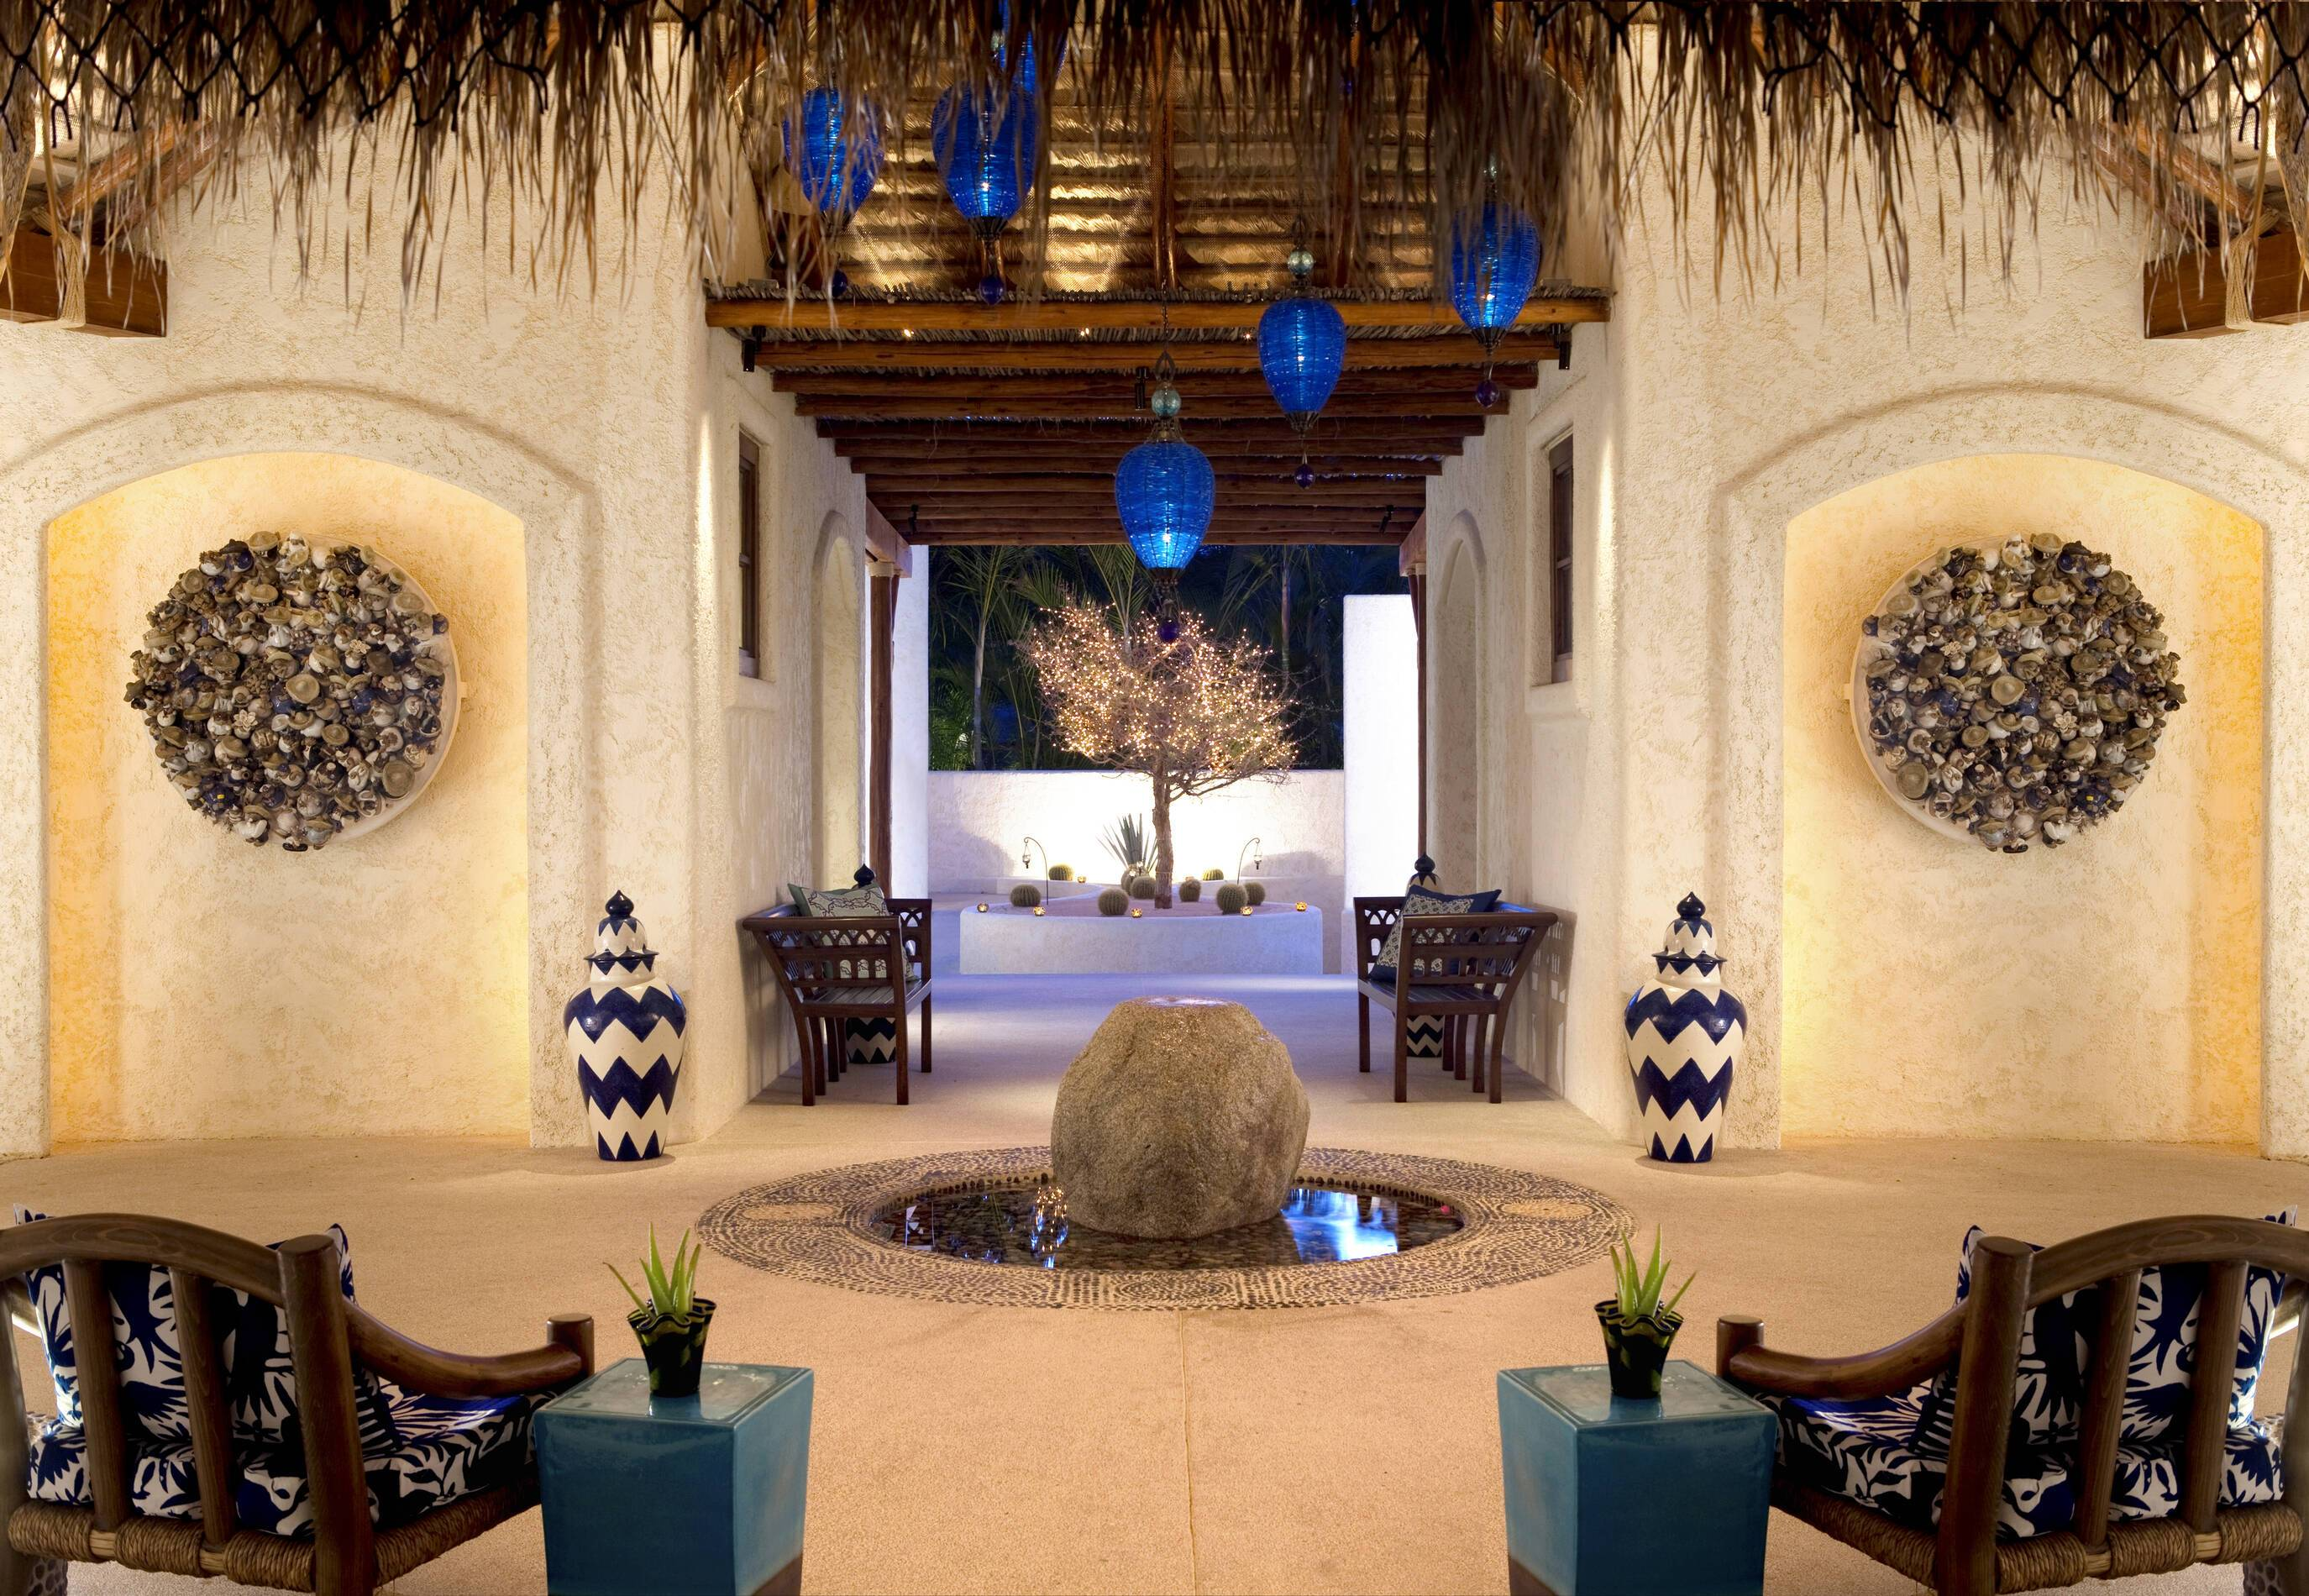 Ventanas Paraiso Mexique Rosewood Spa Entree